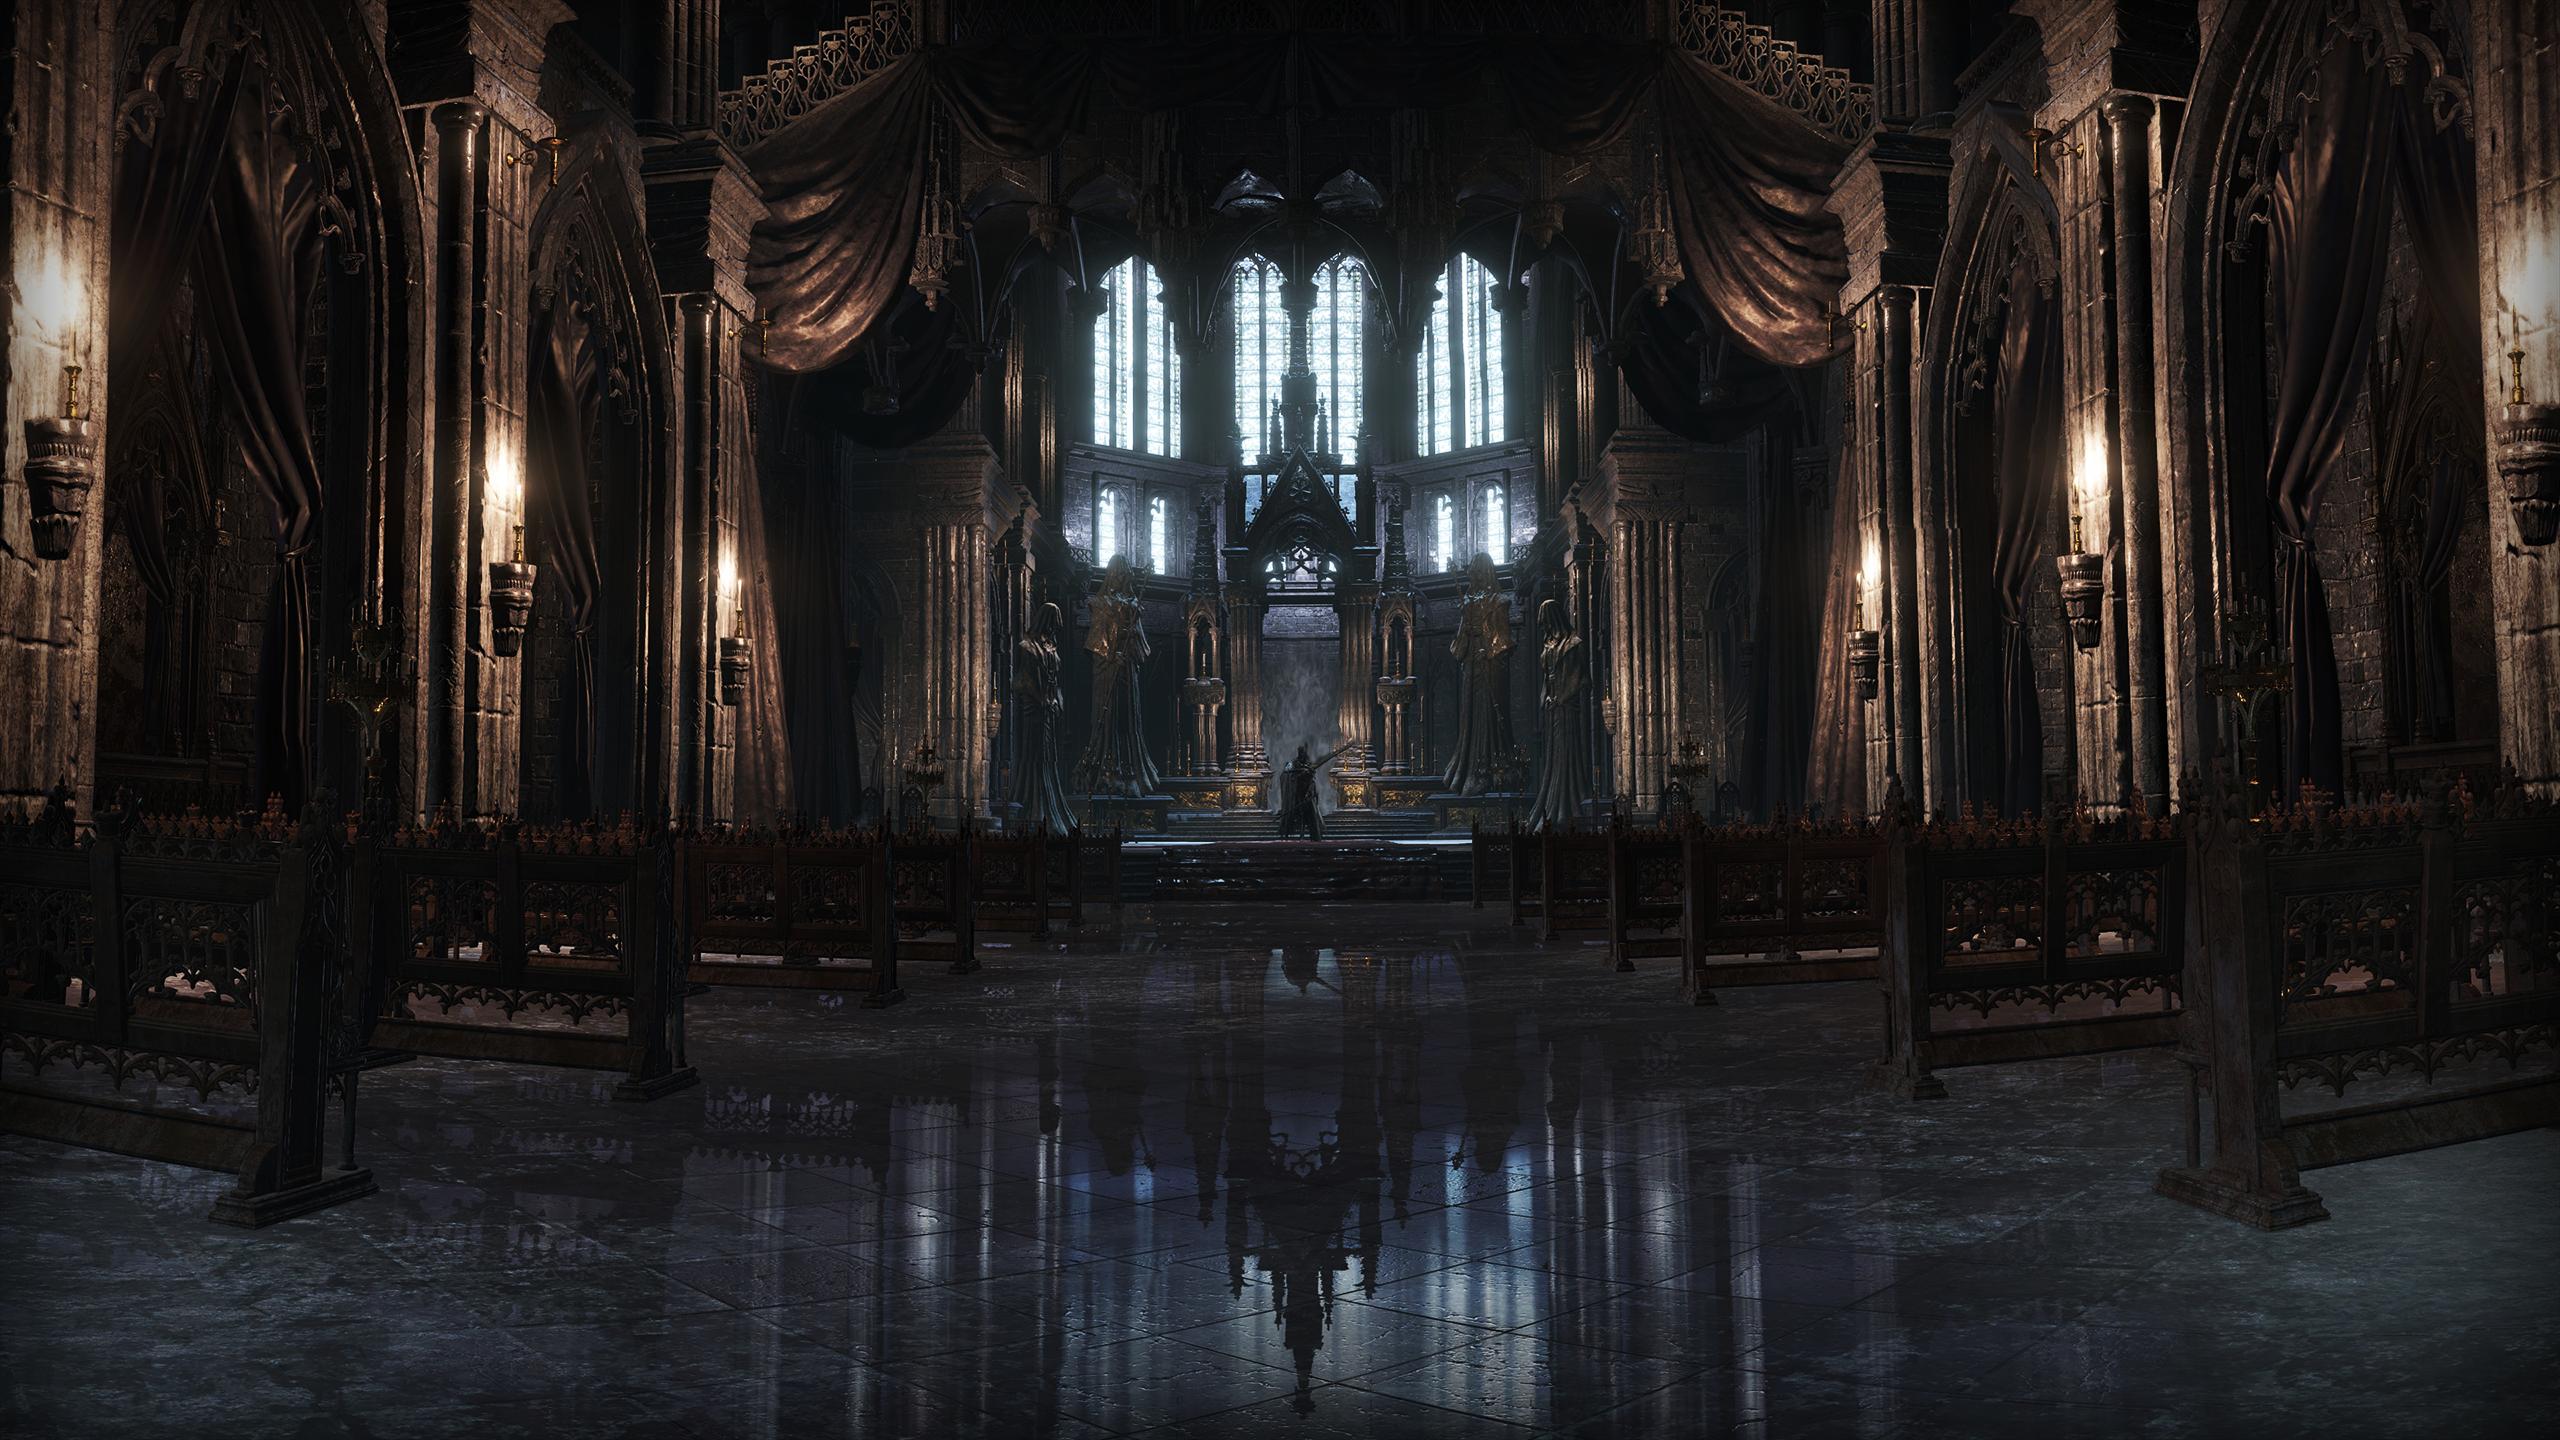 Wallpaper Sunlight Video Games Night Reflection Symmetry